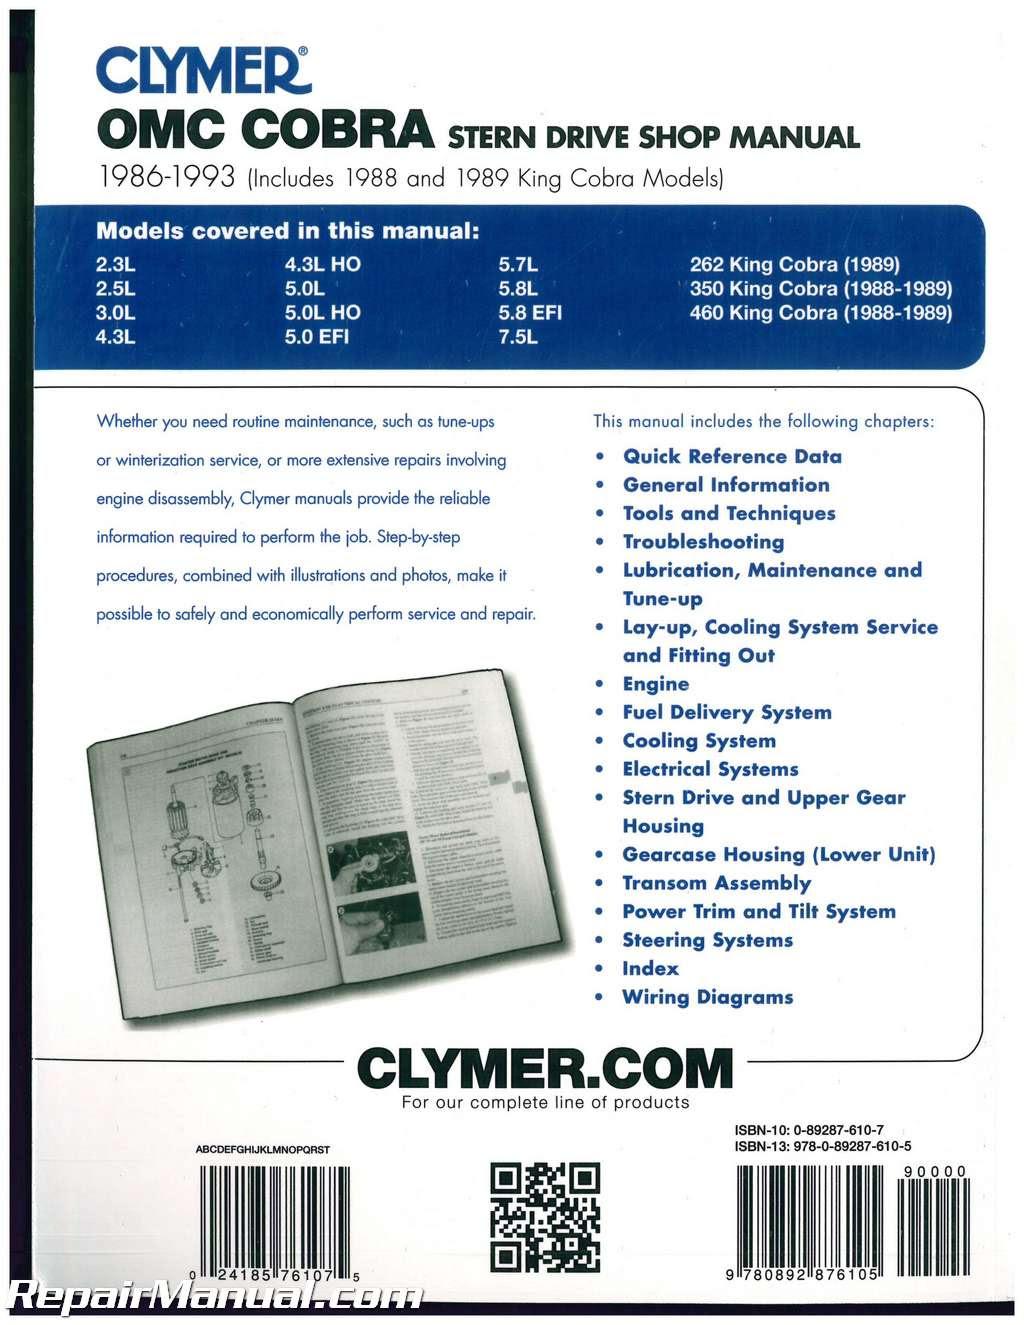 Clymer OMC Cobra 1986-1993 Stern Drive Boat Engine Repair ...